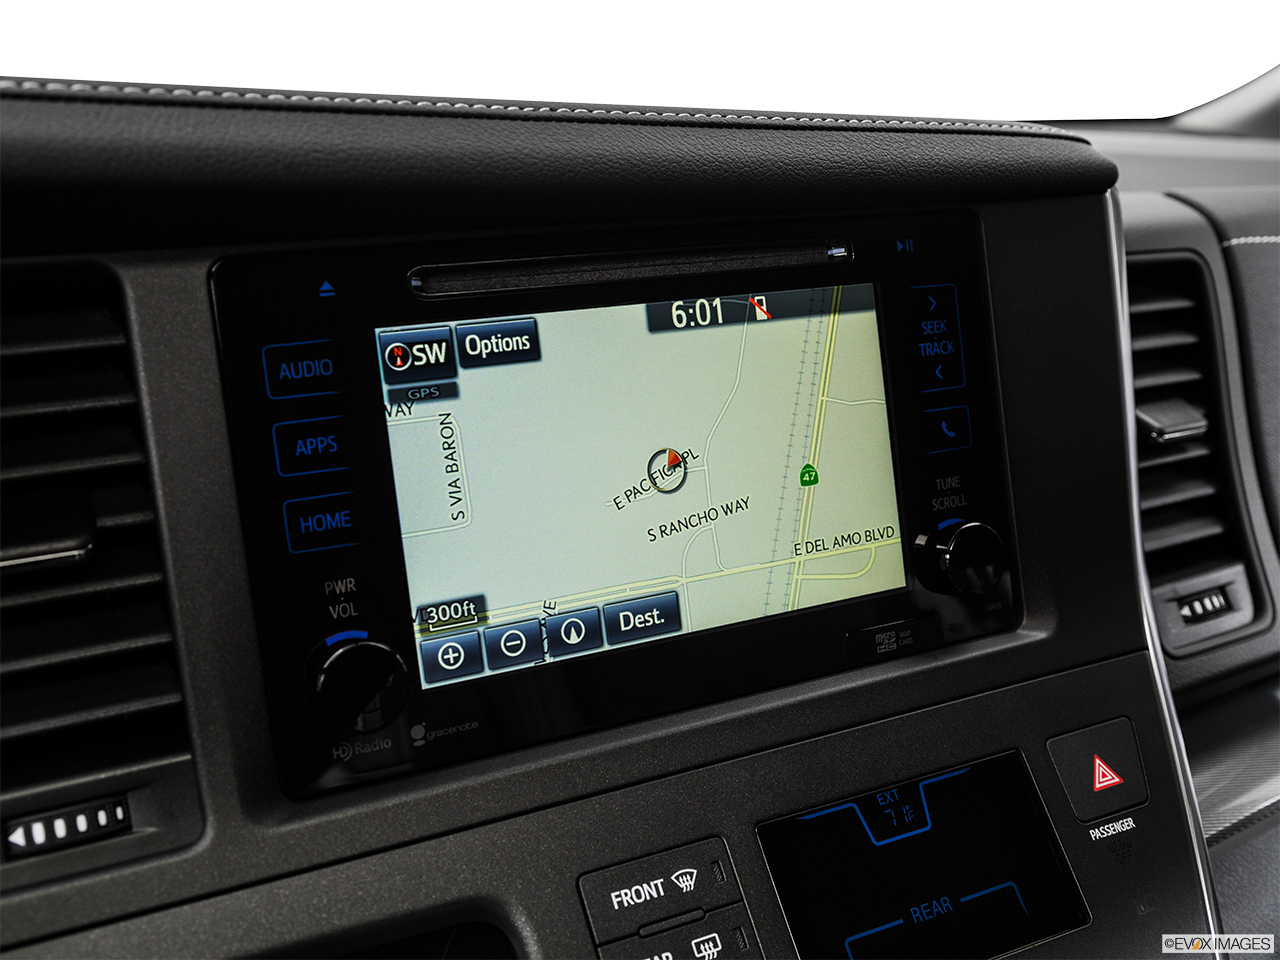 2015 toyota sienna navigation system